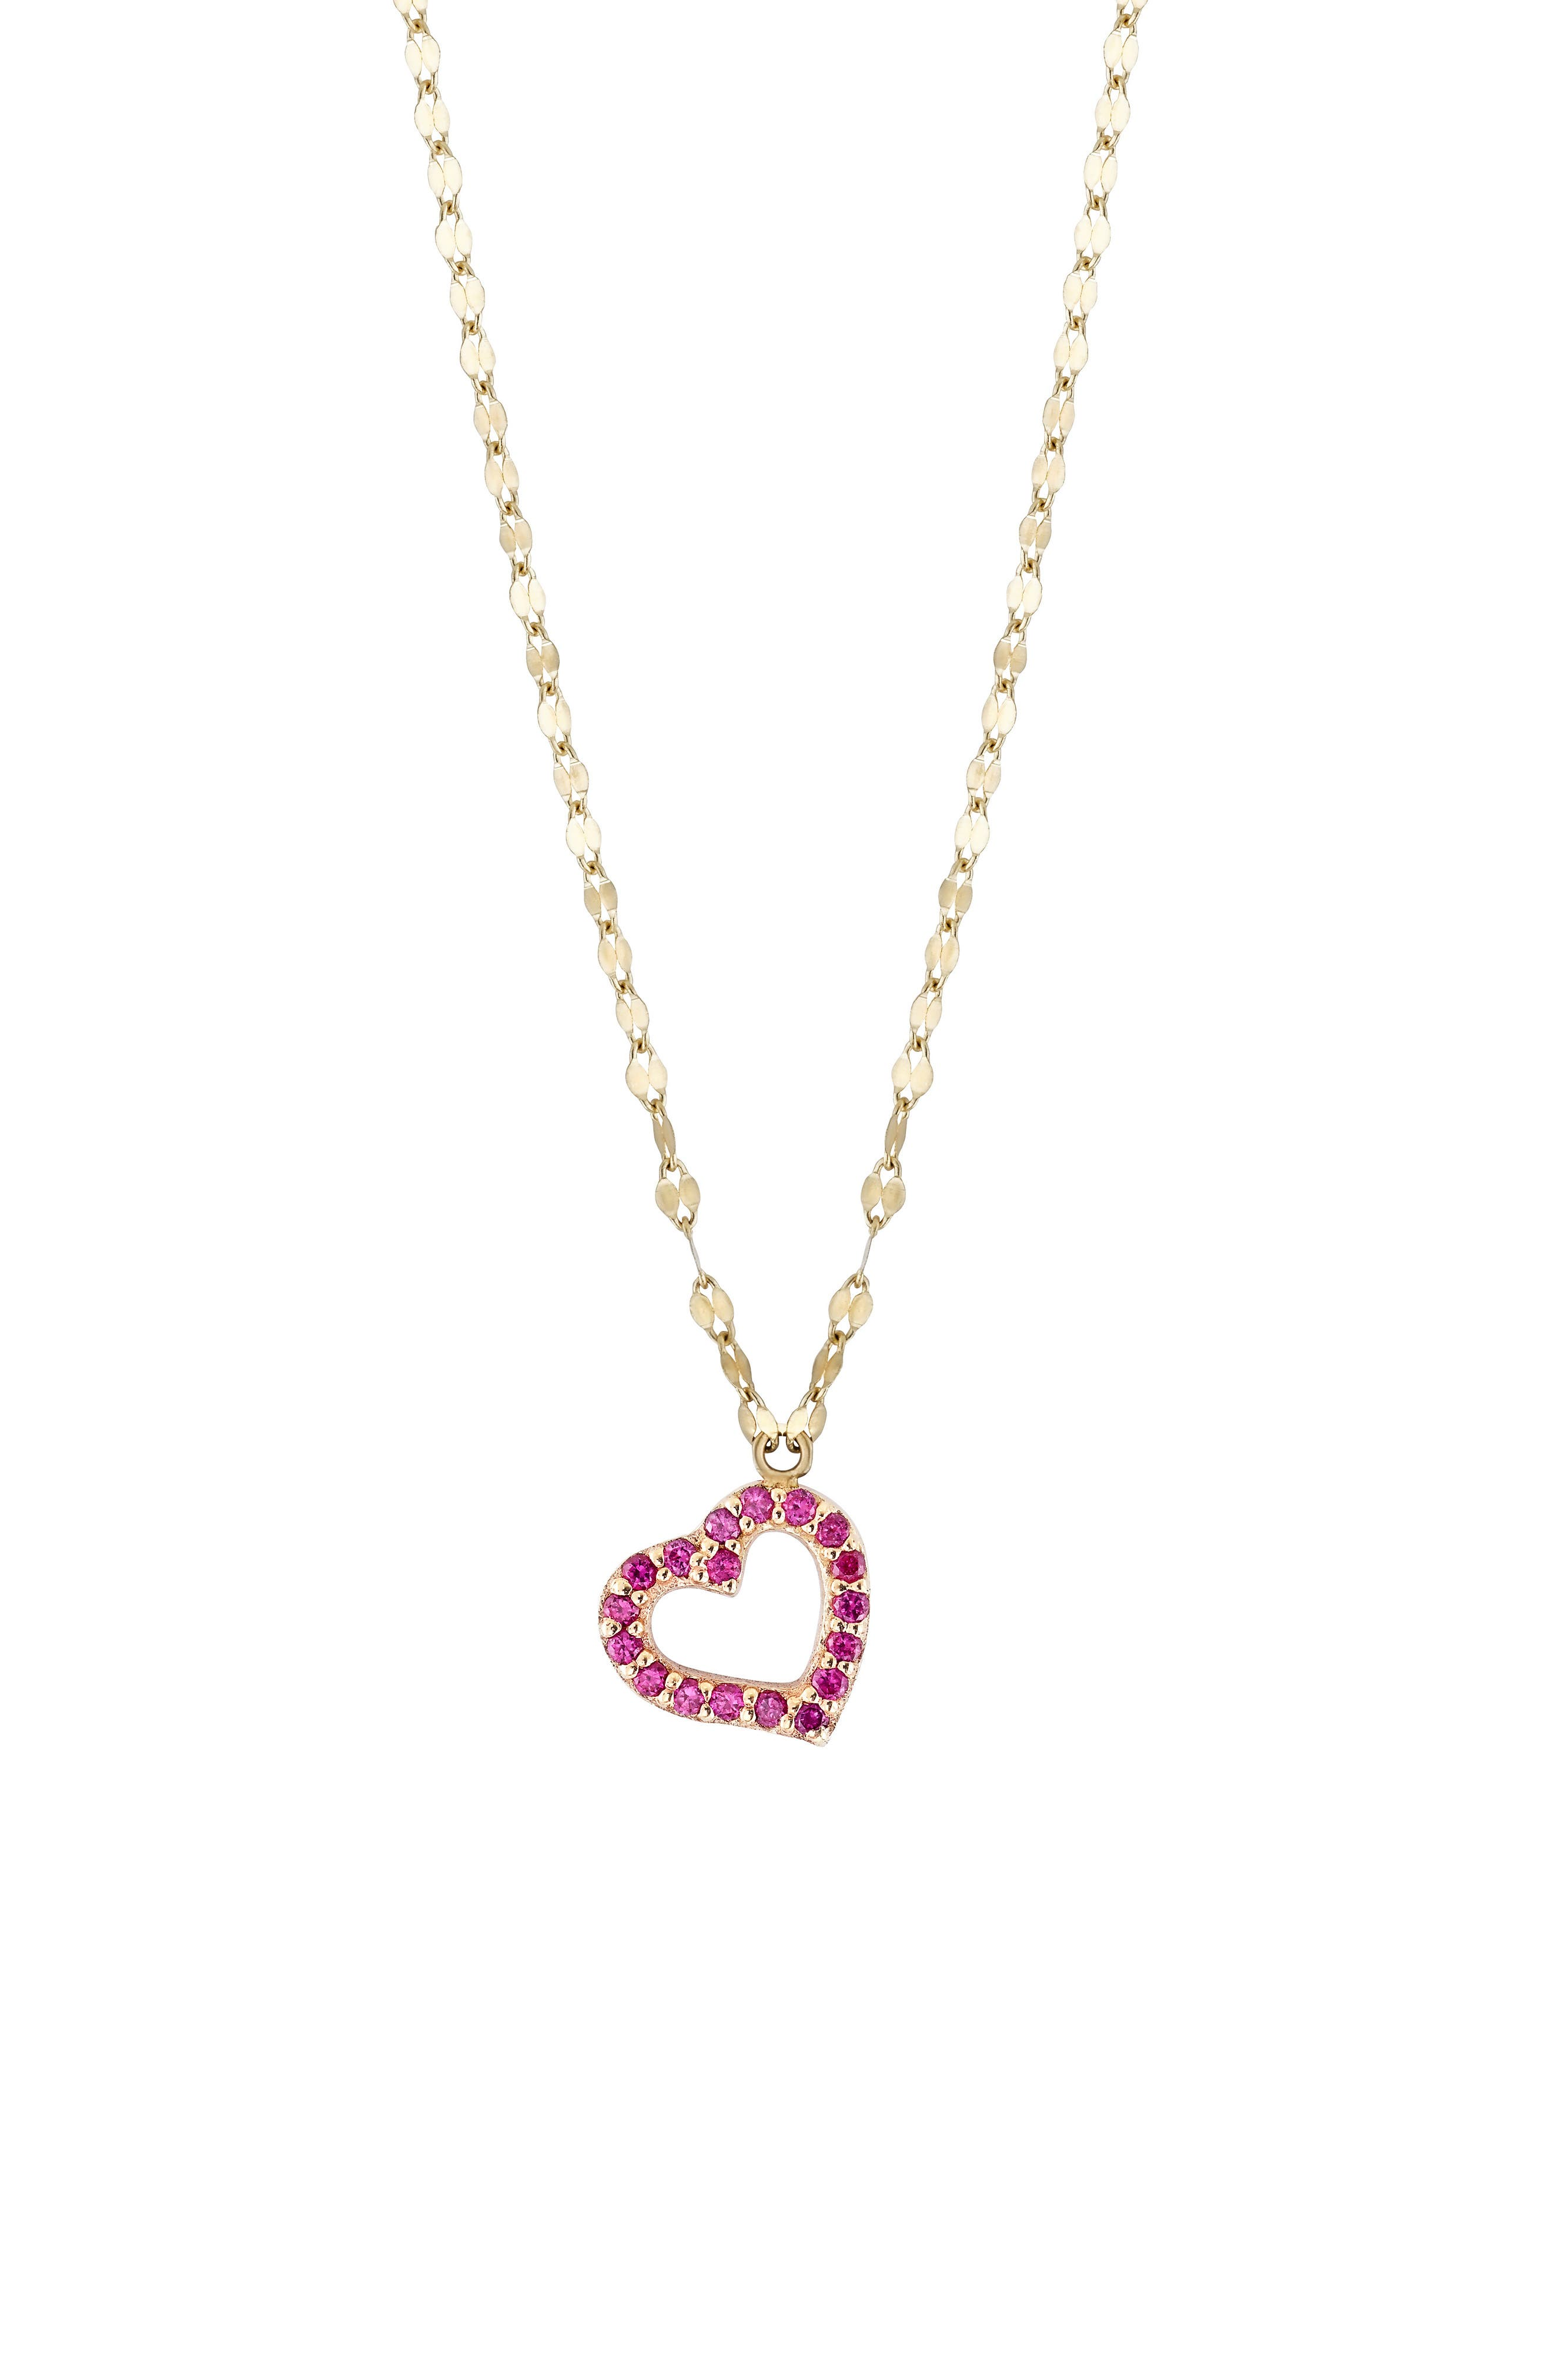 Mini Heart Pendant Necklace,                         Main,                         color, YELLOW GOLD